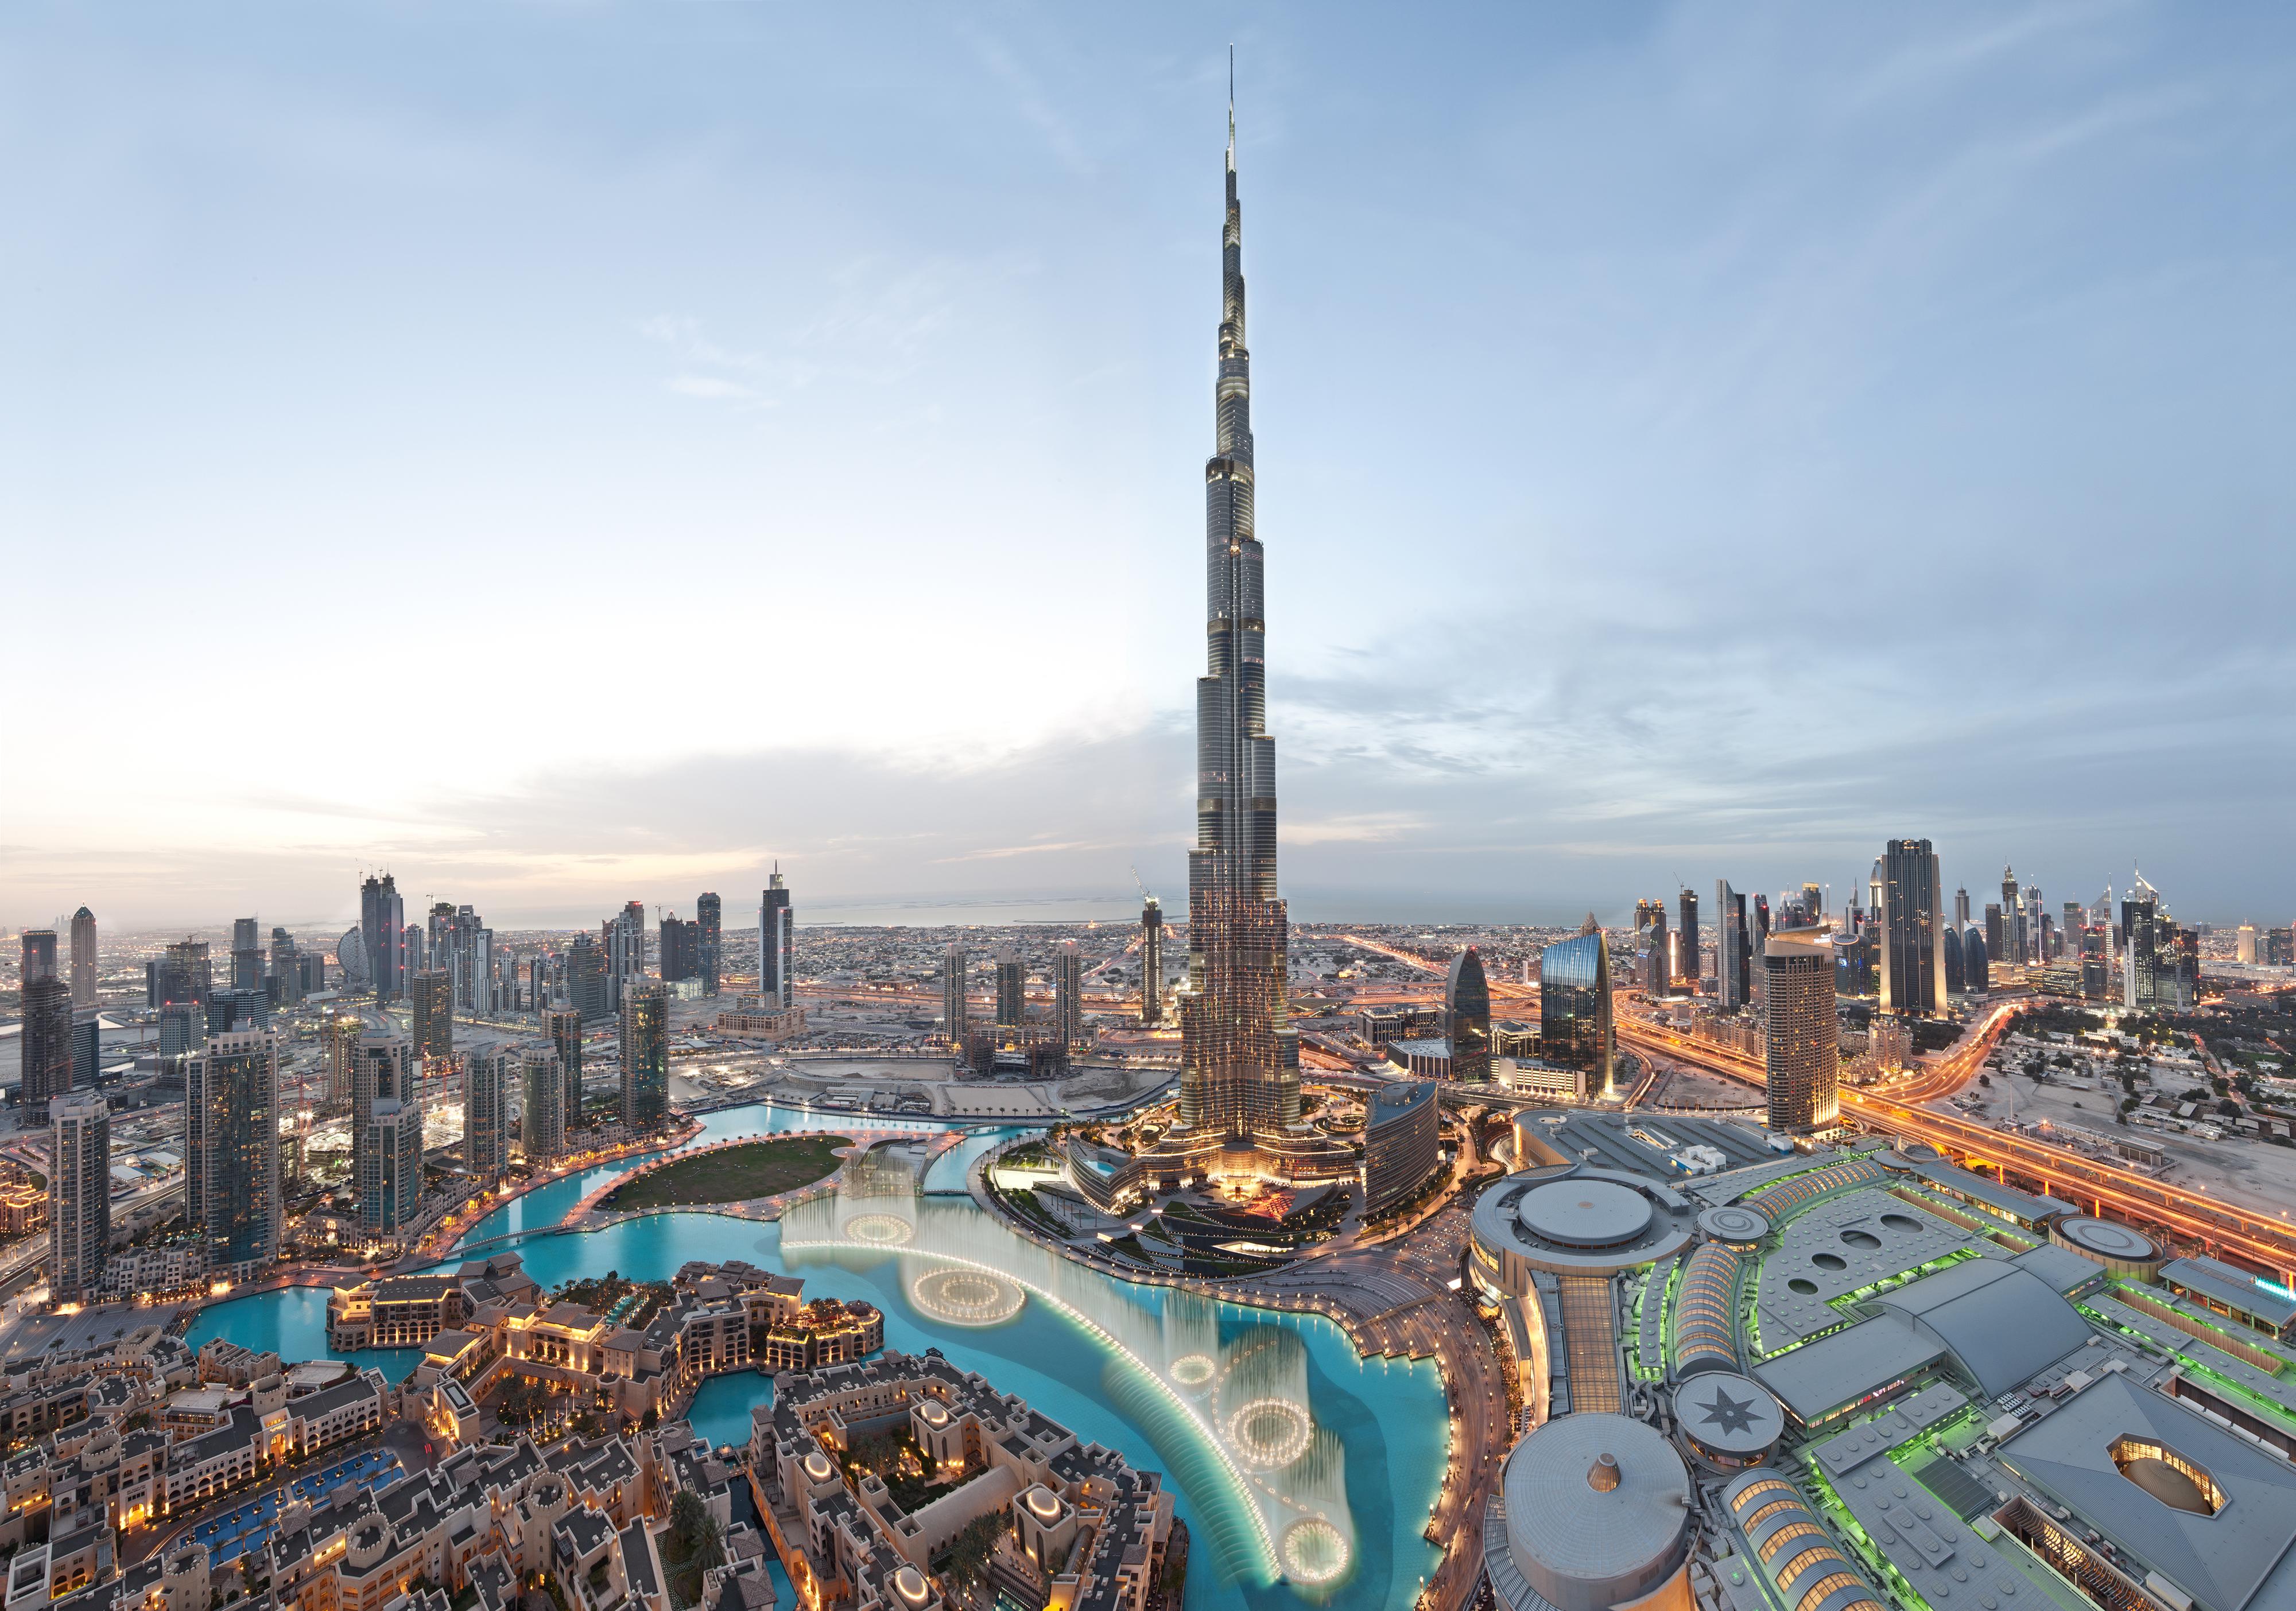 Downtown Dubai Overview